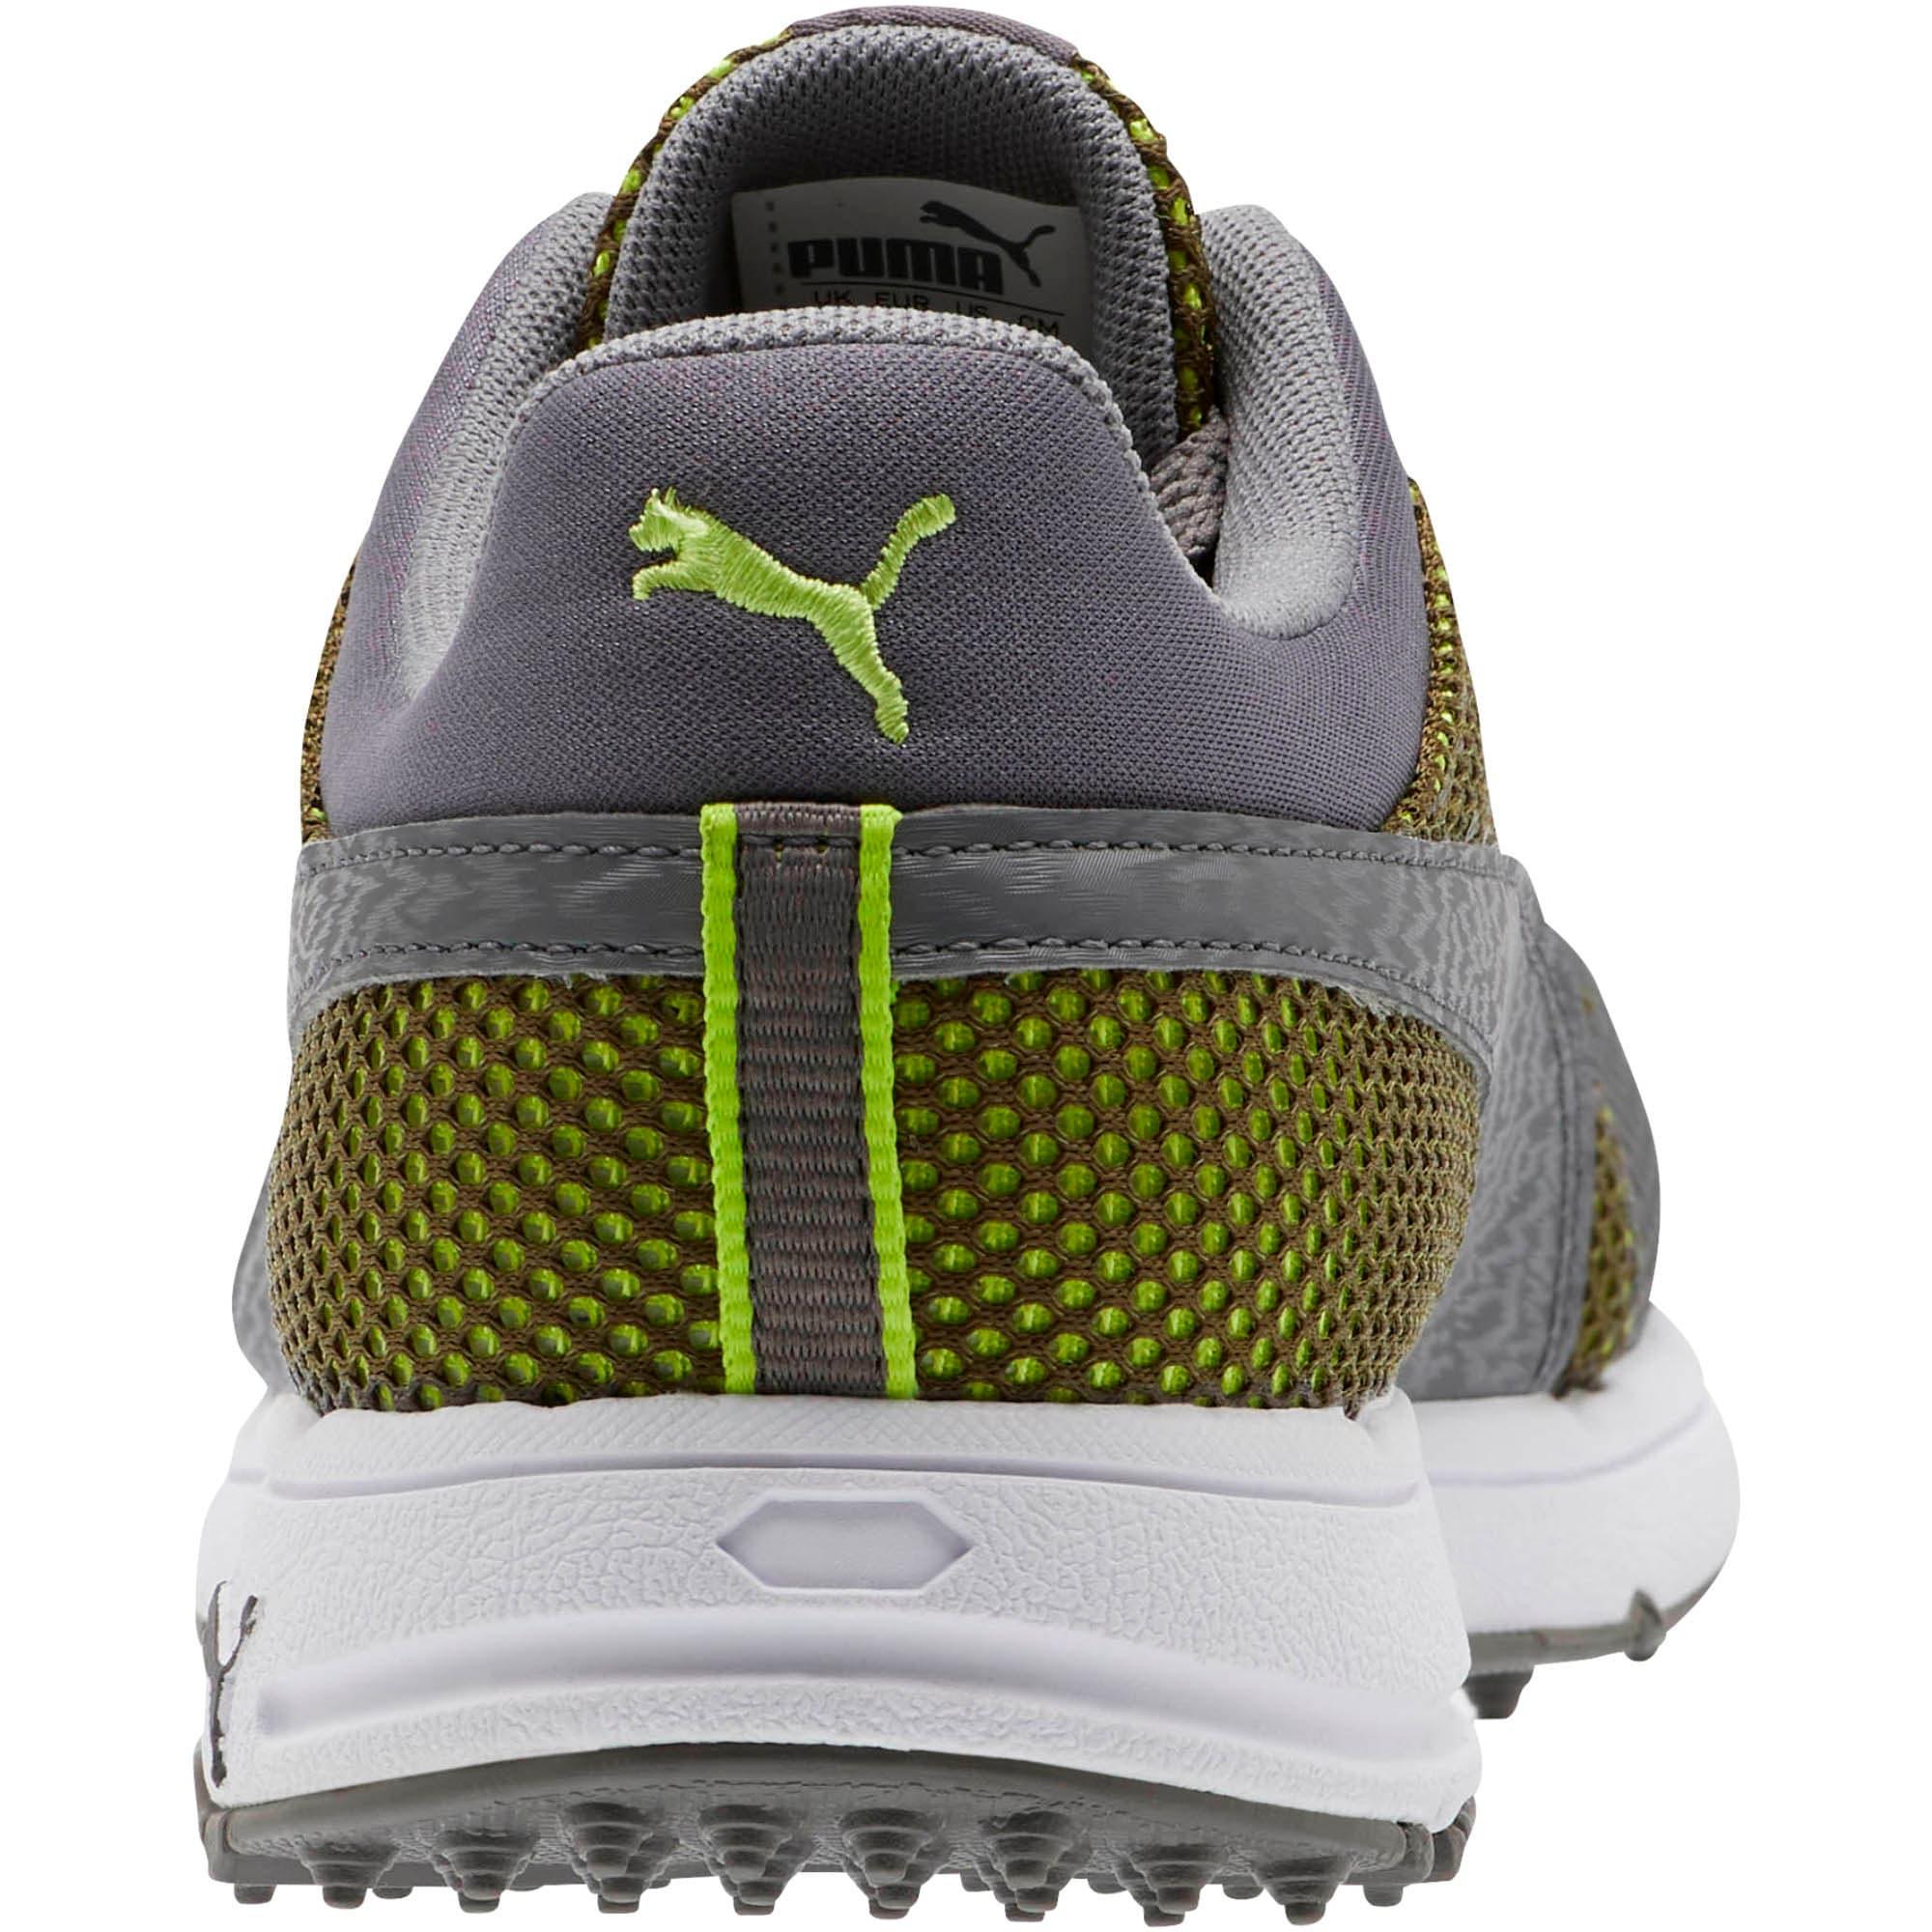 Thumbnail 3 of GRIP Sport Tech Men's Golf Shoes, QUIET SHADE-QUIET SHADE-Lime, medium